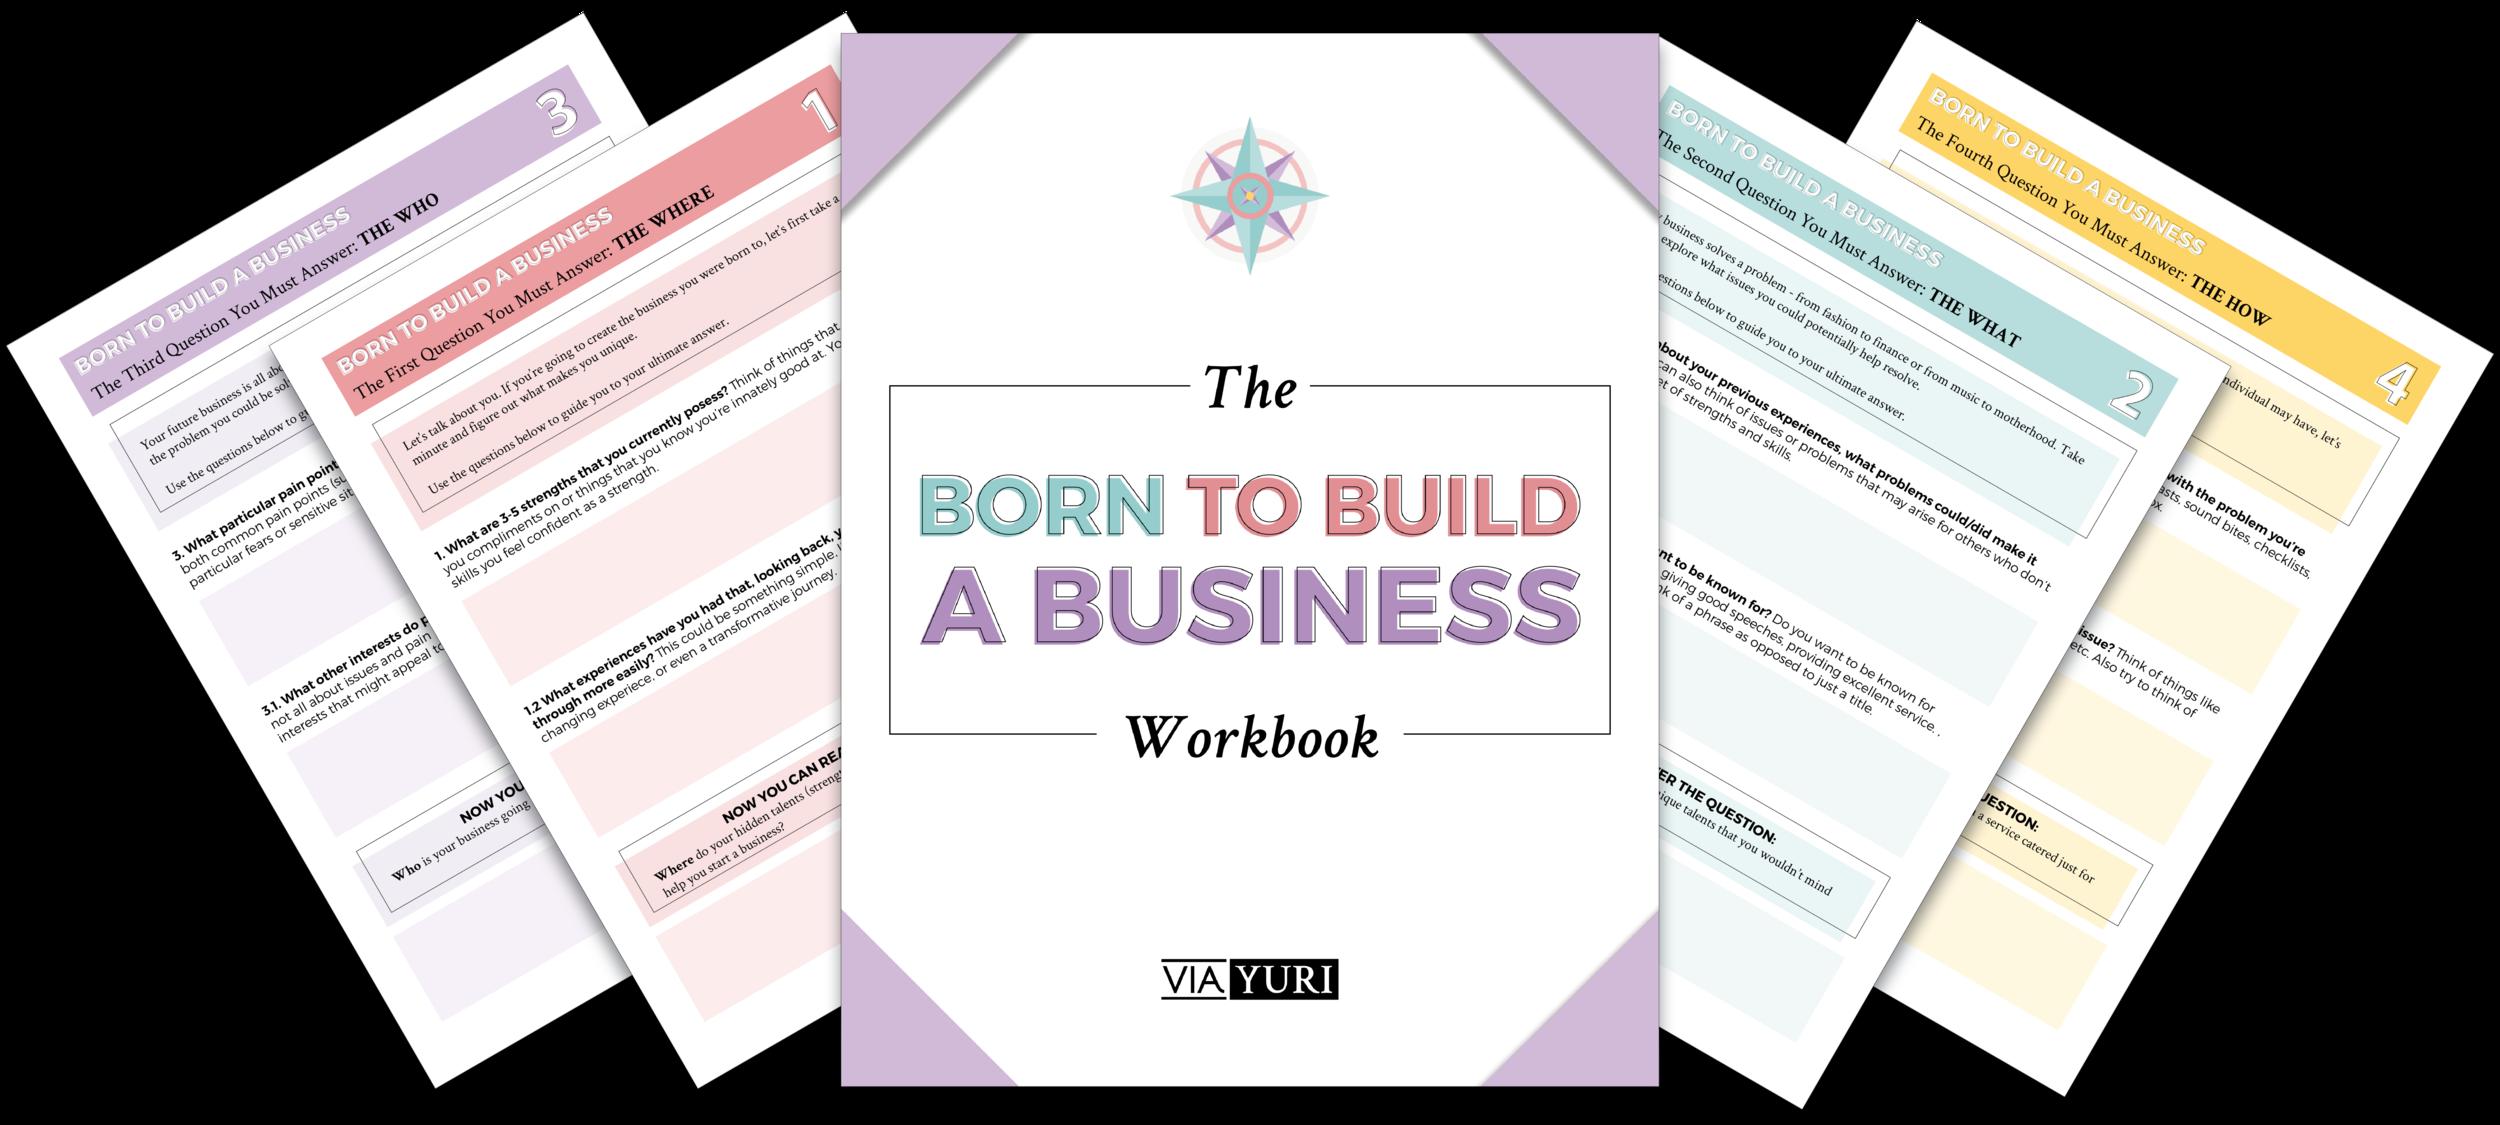 Branding 101 | The 2 Essentials Components that make up your brand | Business and Brand Essentials - viaYuri.com